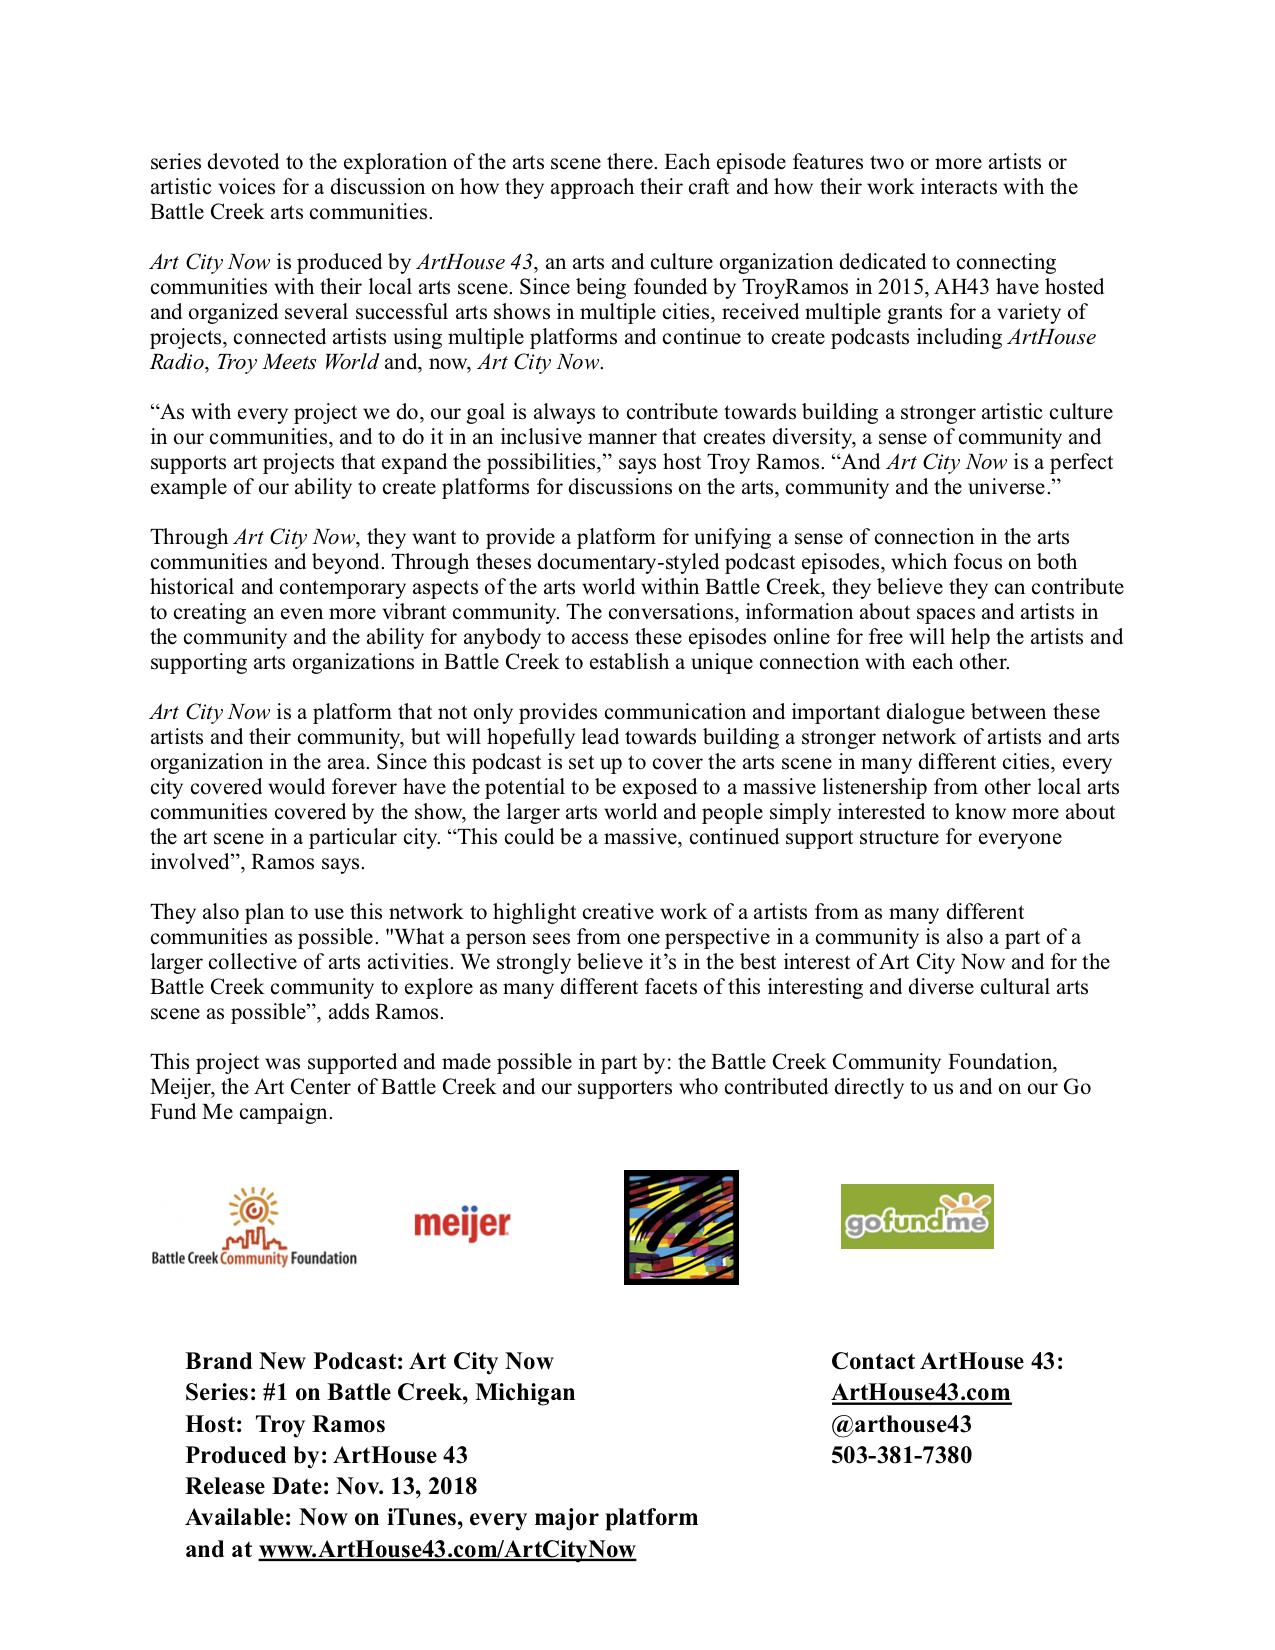 Art City Now Official Press Release P2.jpg